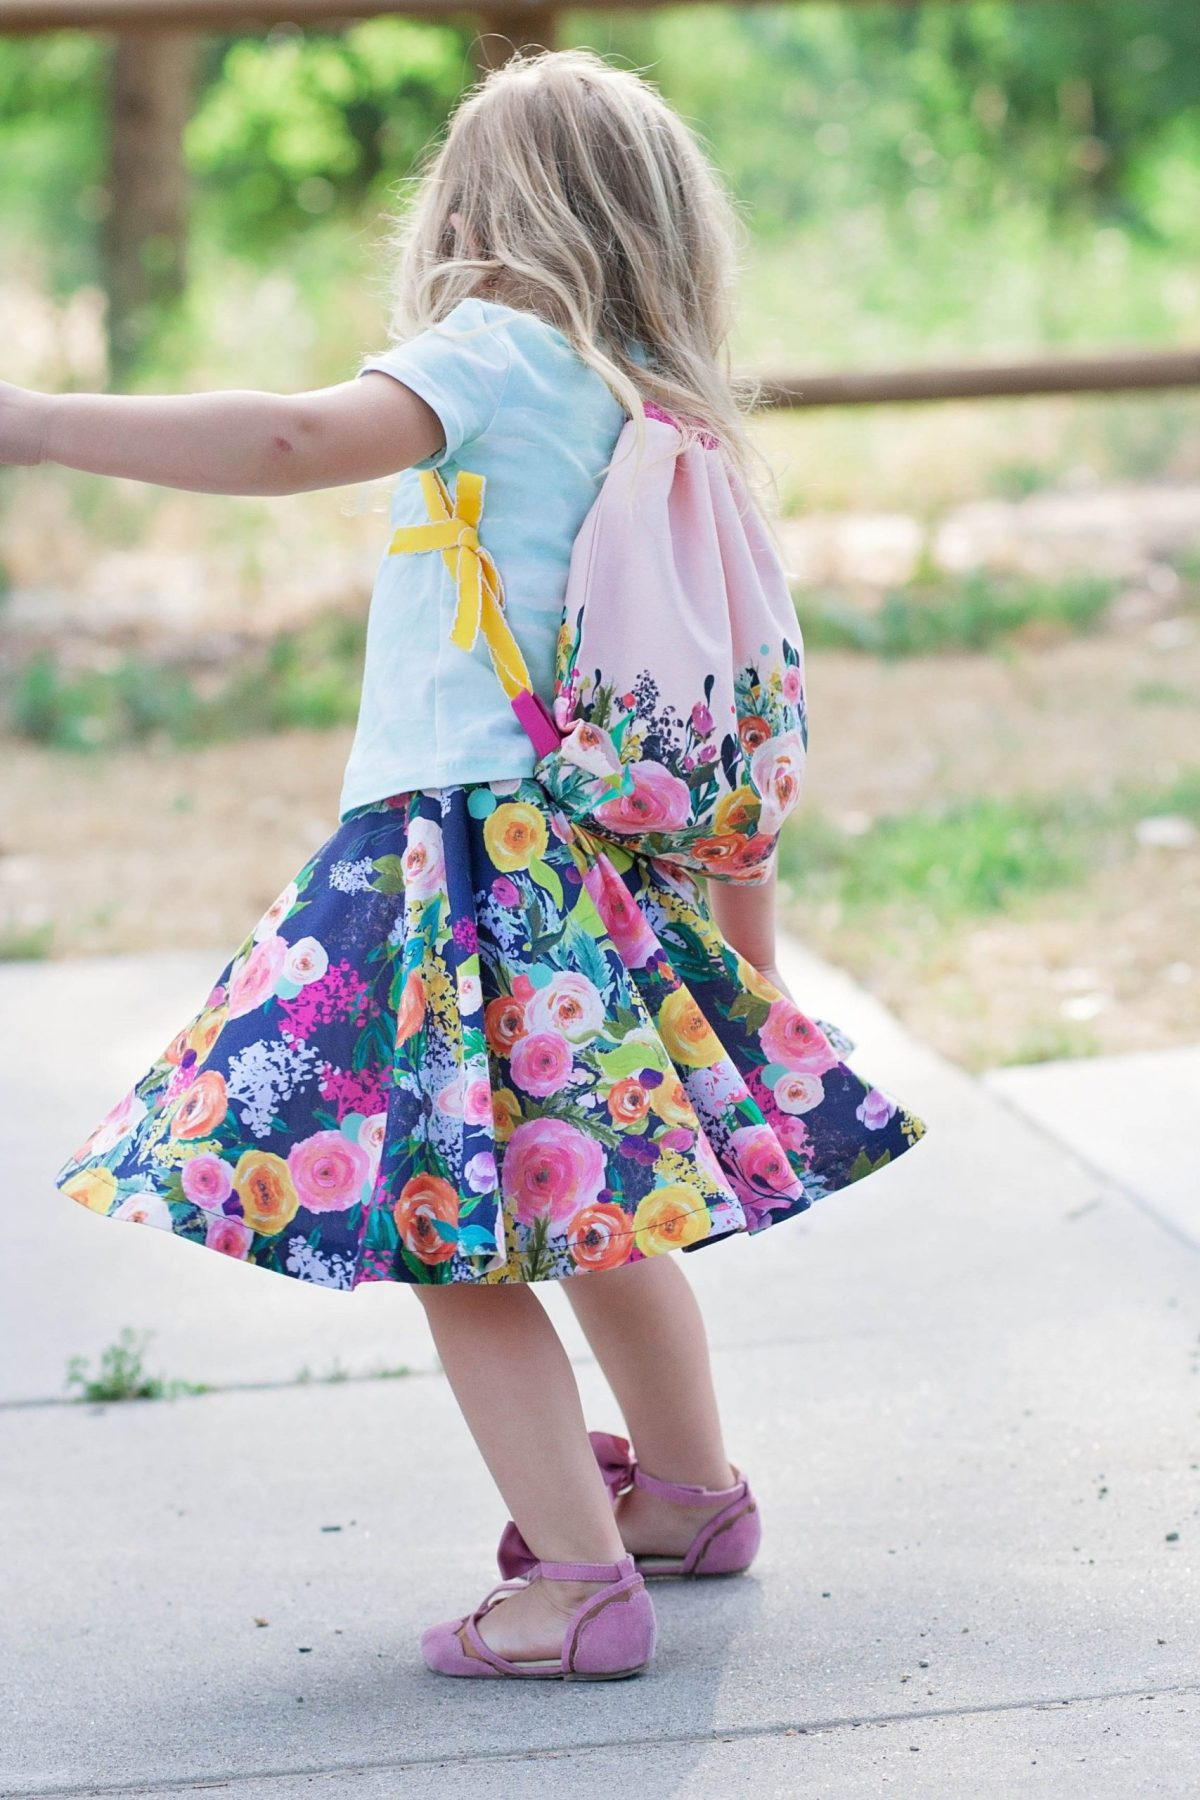 Kids' flower backpack DIY Backpacks Ideas For Your Kids' Back-To-School Season